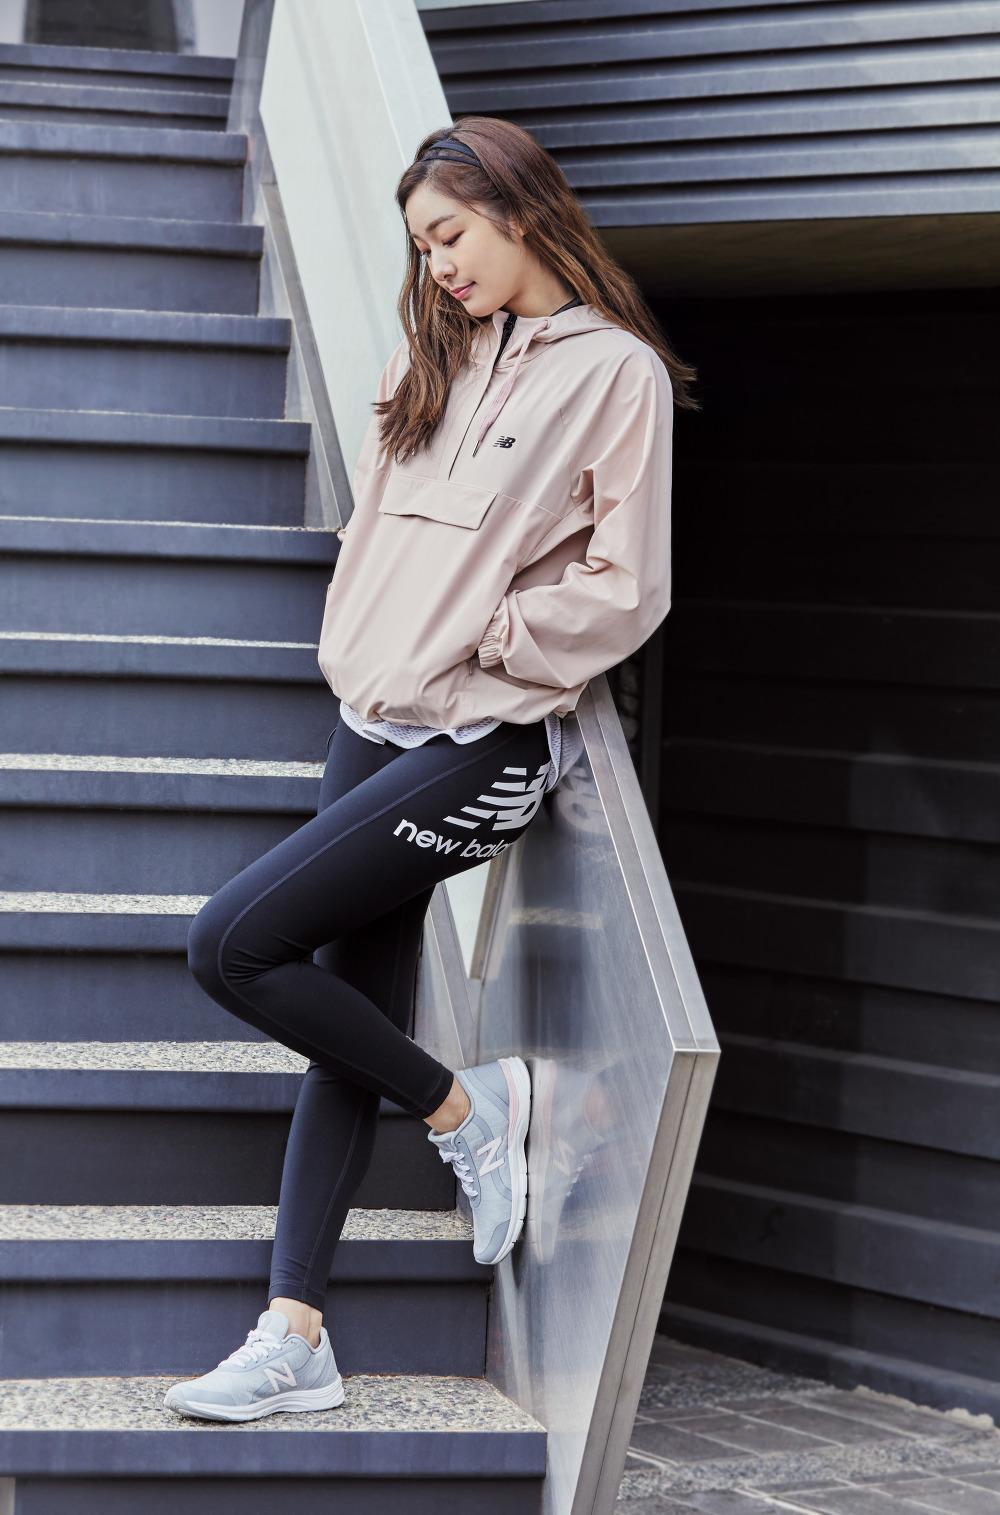 newBalance 2018ss Yuna Kim_16_WX711HW3